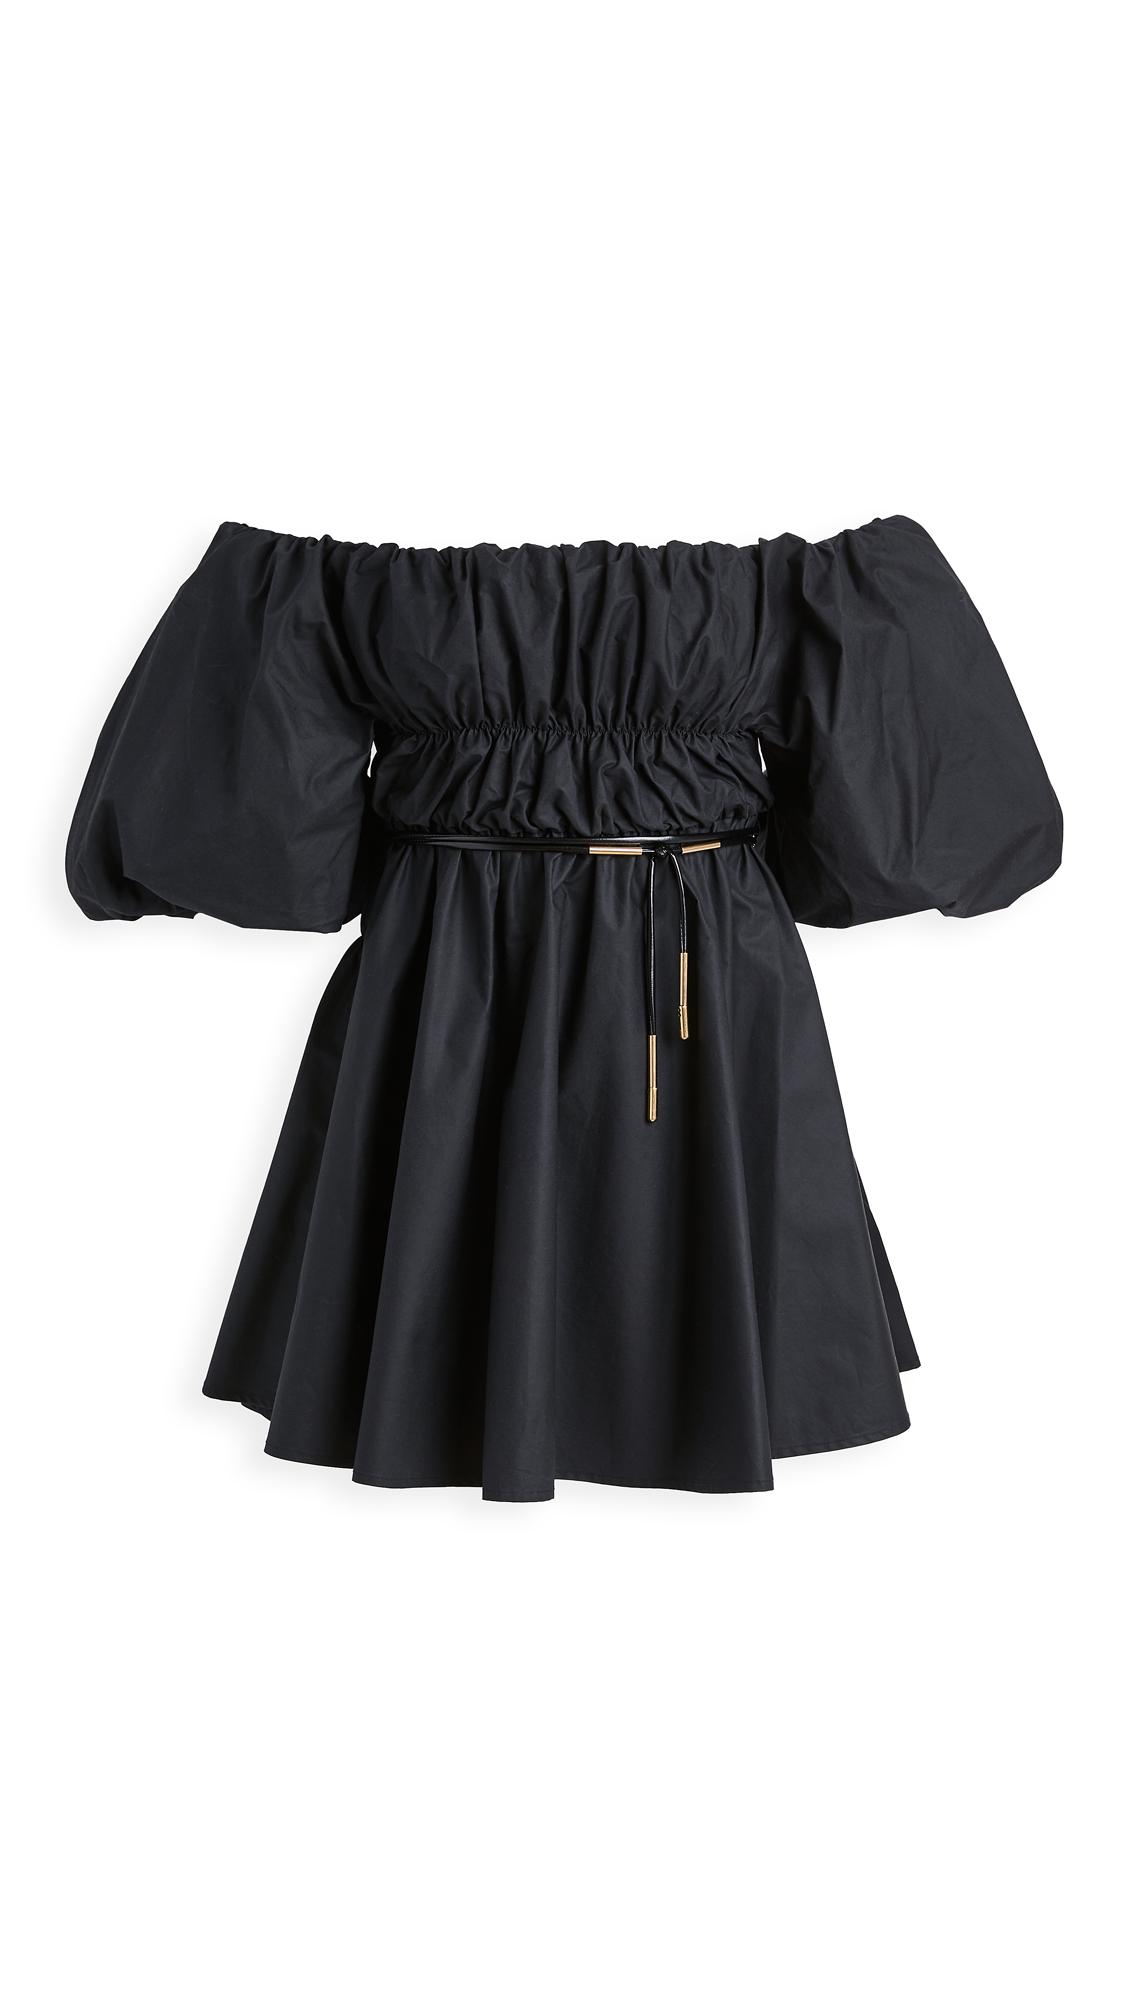 Ellery Freedom Off Shoulder Puffed Sleeve Dress - 30% Off Sale